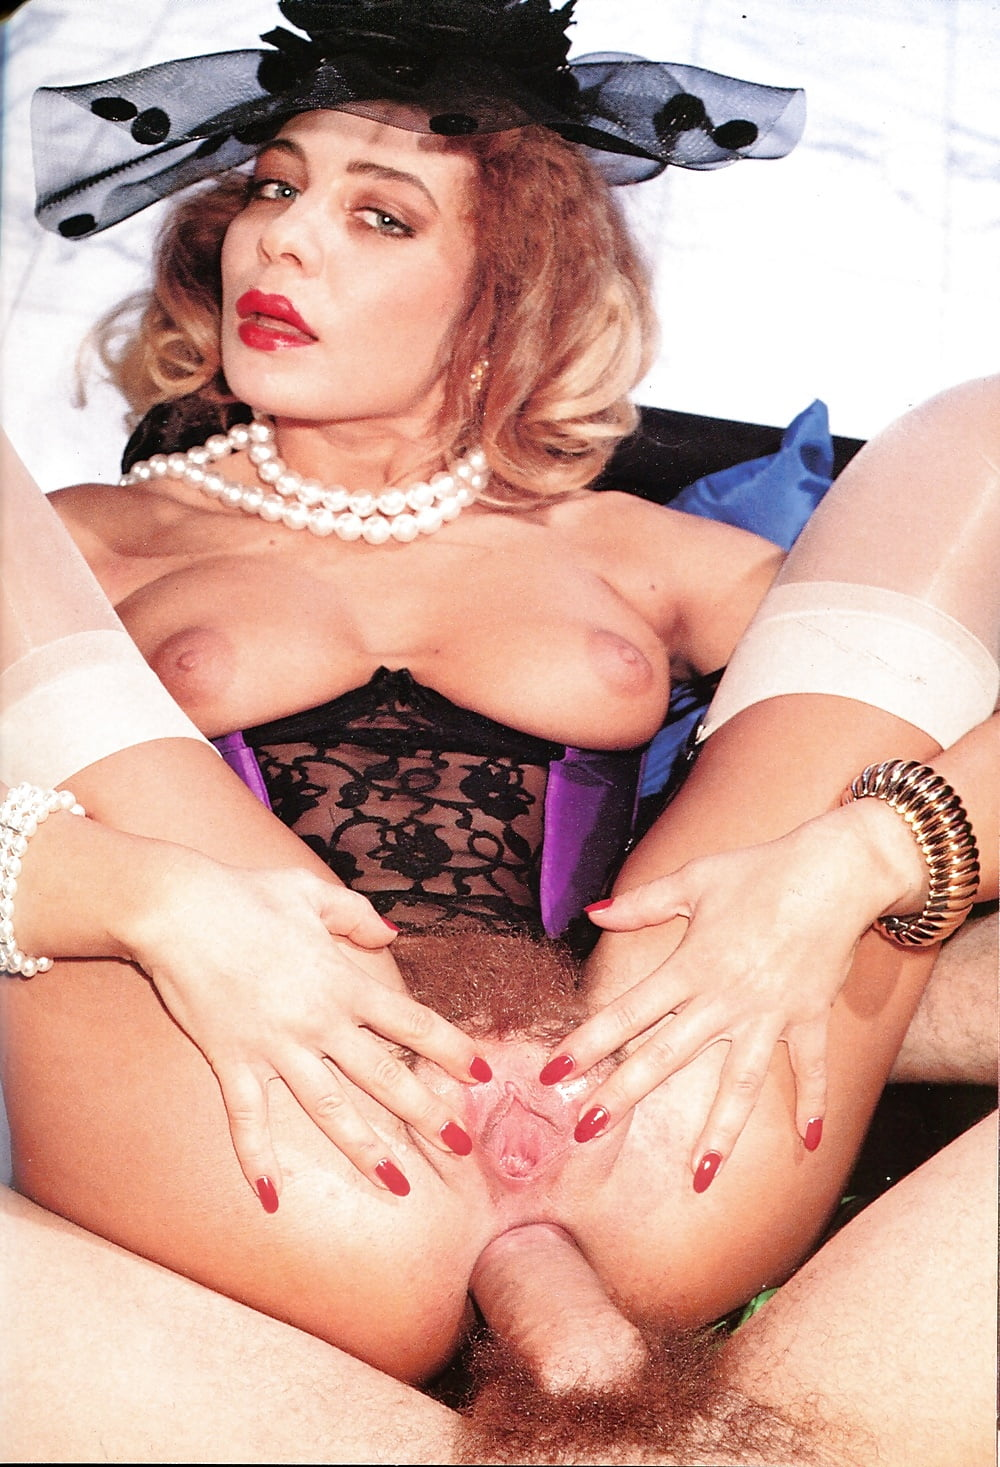 Супер журнал макс порно смотреть онлайн, фото трах огромных сисек